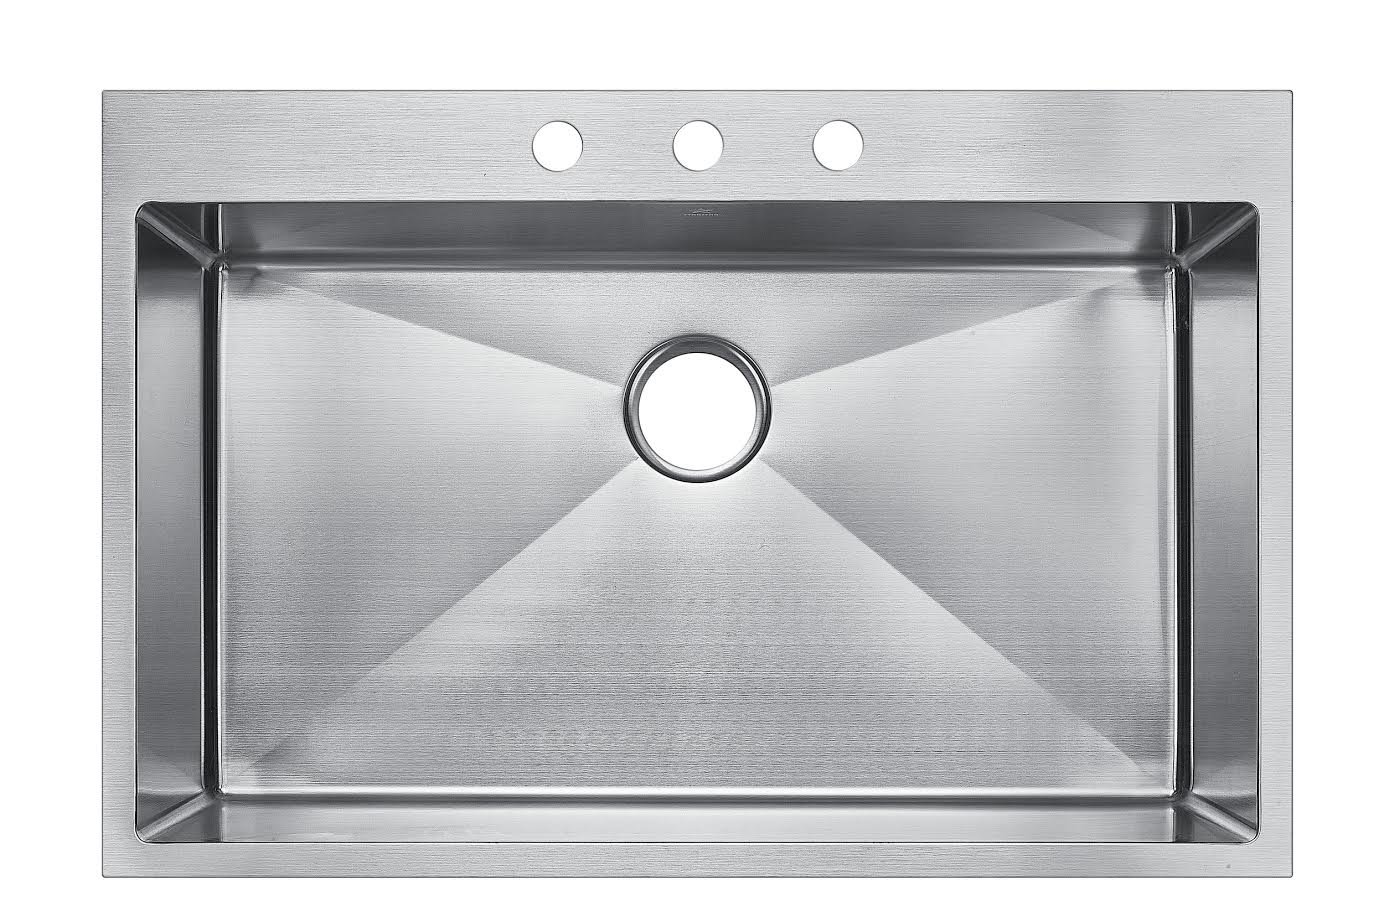 Starstar 30 X 22 Top-mount Single Bowl Kitchen Sink Drop-in 304 Stainless  Steel 16 Gauge